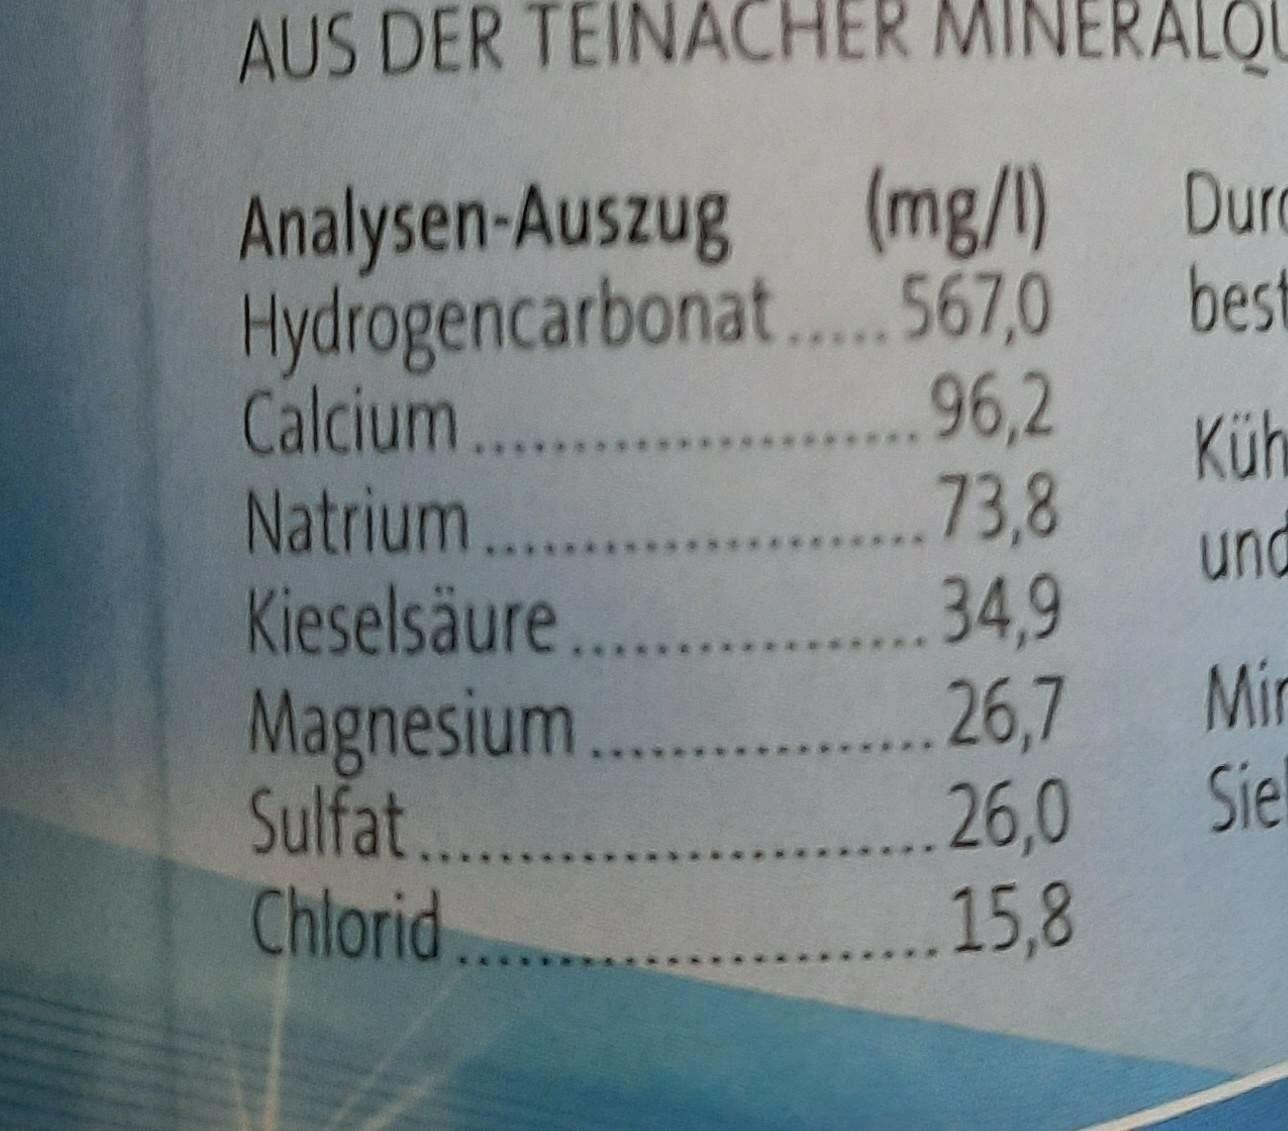 Medium Wasser - Valori nutrizionali - de